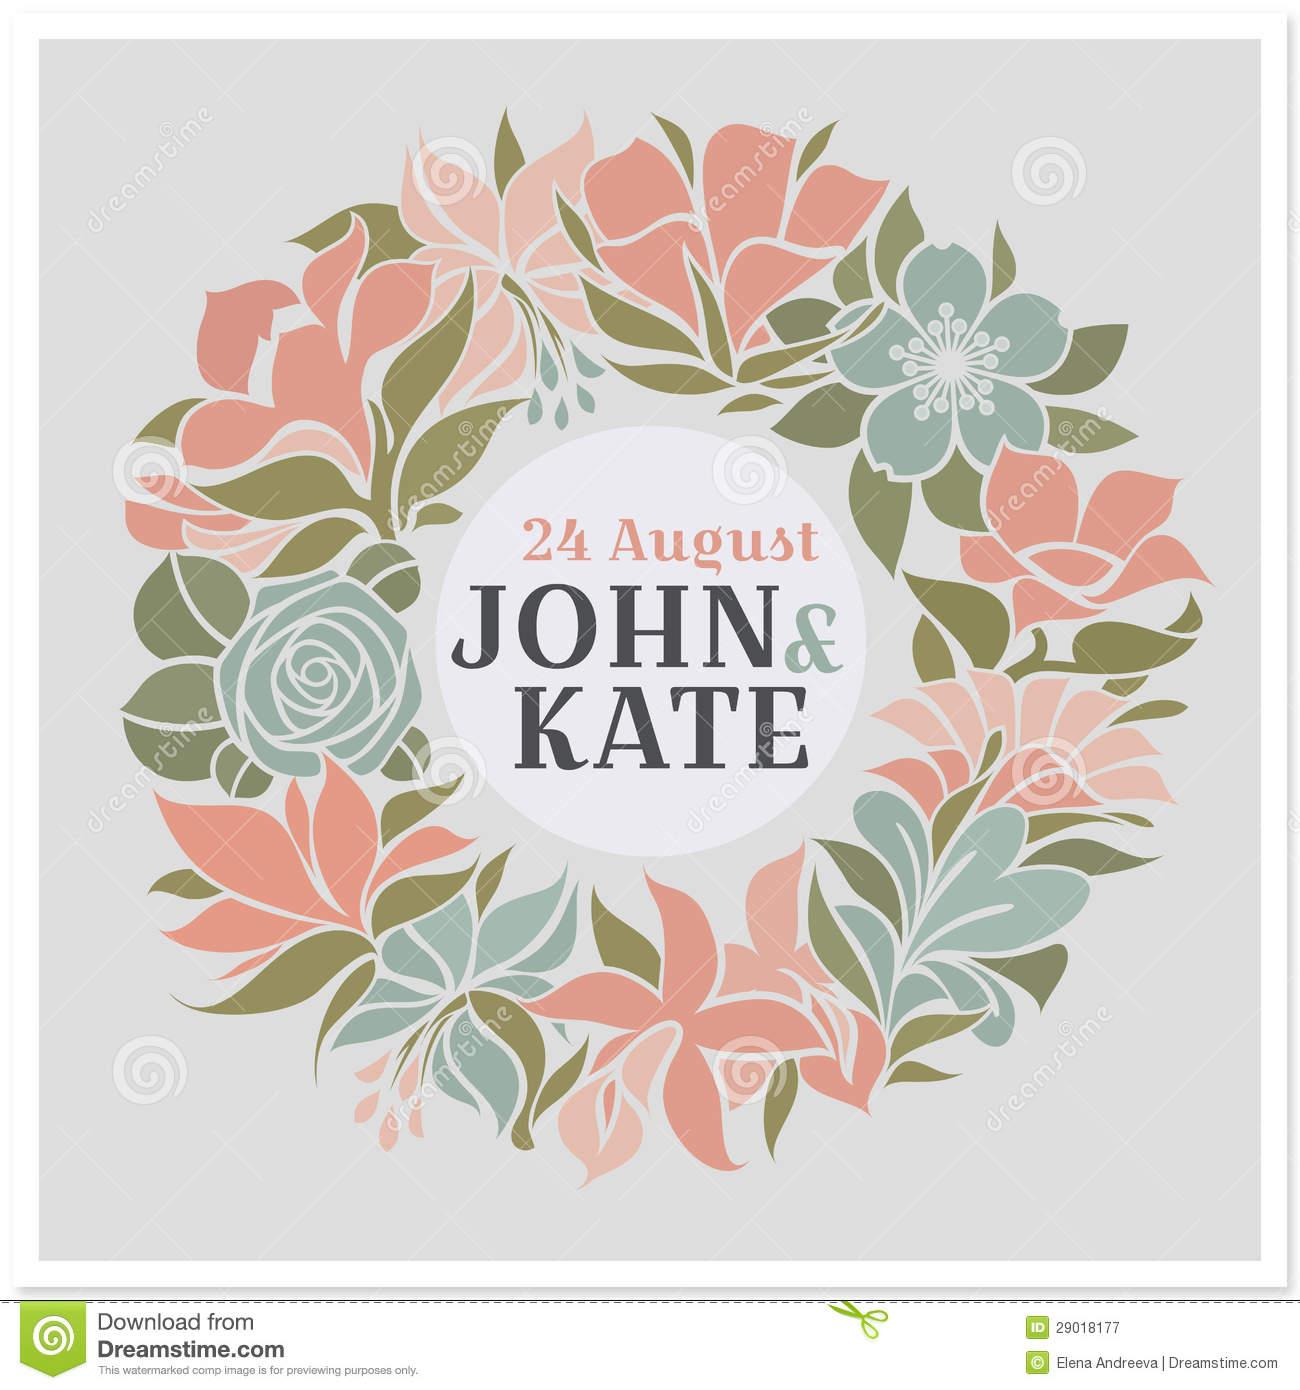 20 wedding vector designs images free vector wedding cards